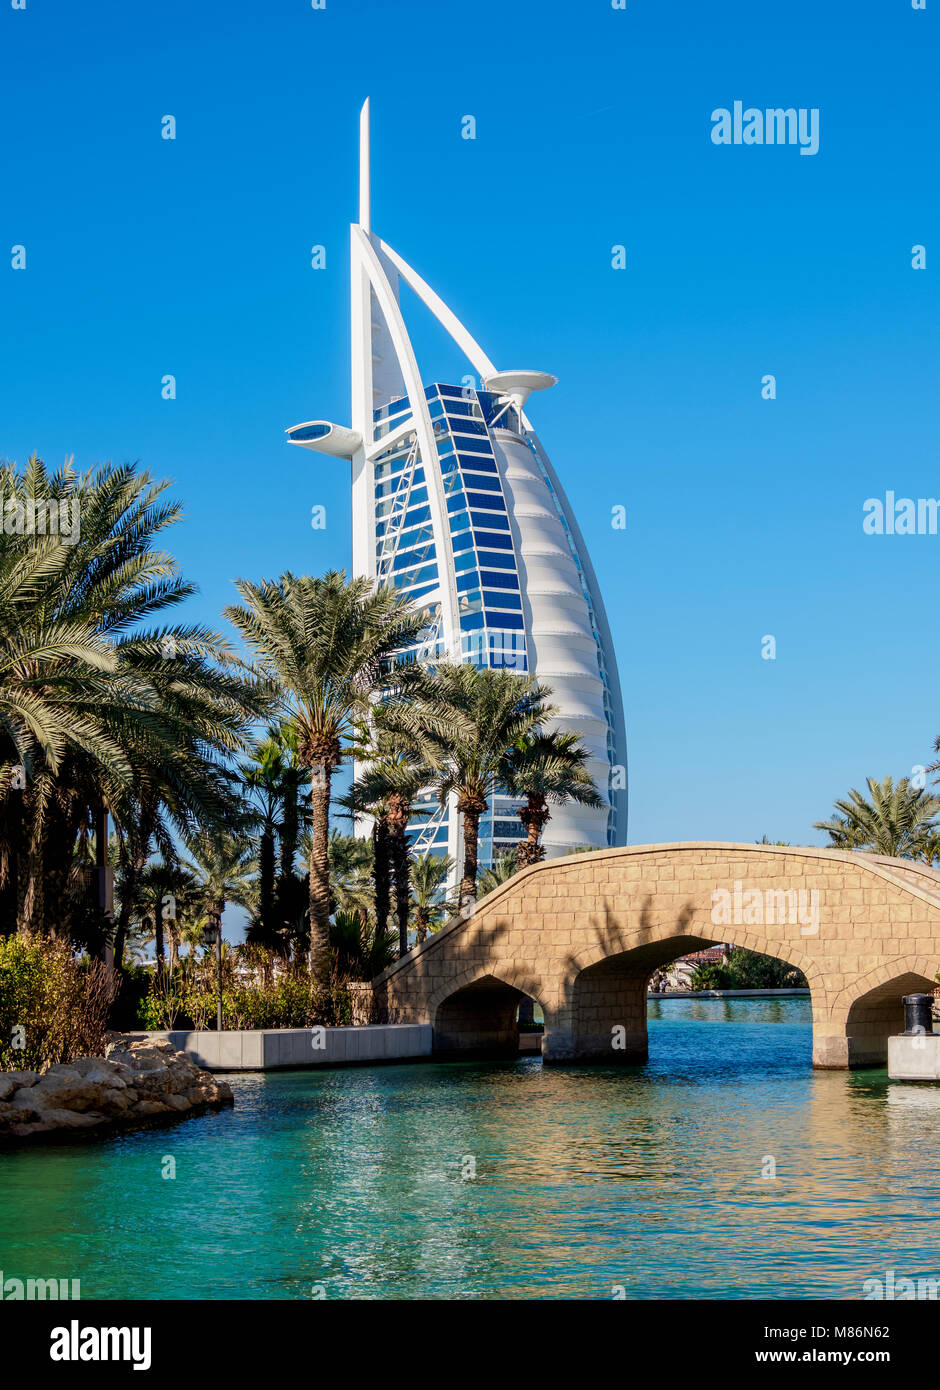 Medinat Jumeirah and Burj Al Arab Luxury Hotel, Dubai, United Arab Emirates - Stock Image